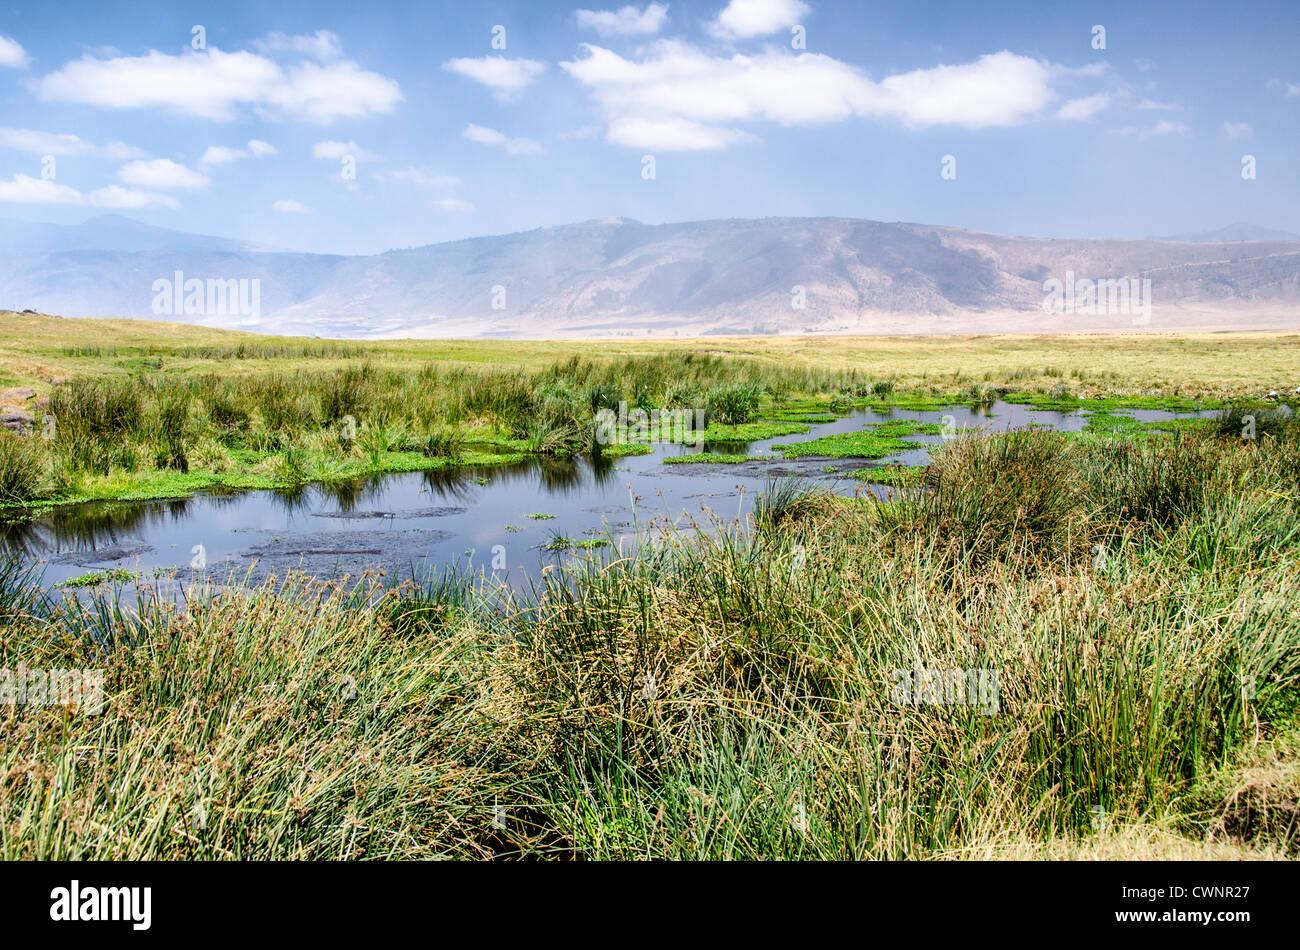 NGORONGORO CONSERVATIONAL AREA, Tanzania - A small watering hole at Ngorongoro Crater in the Ngorongoro Conservation Stock Photo